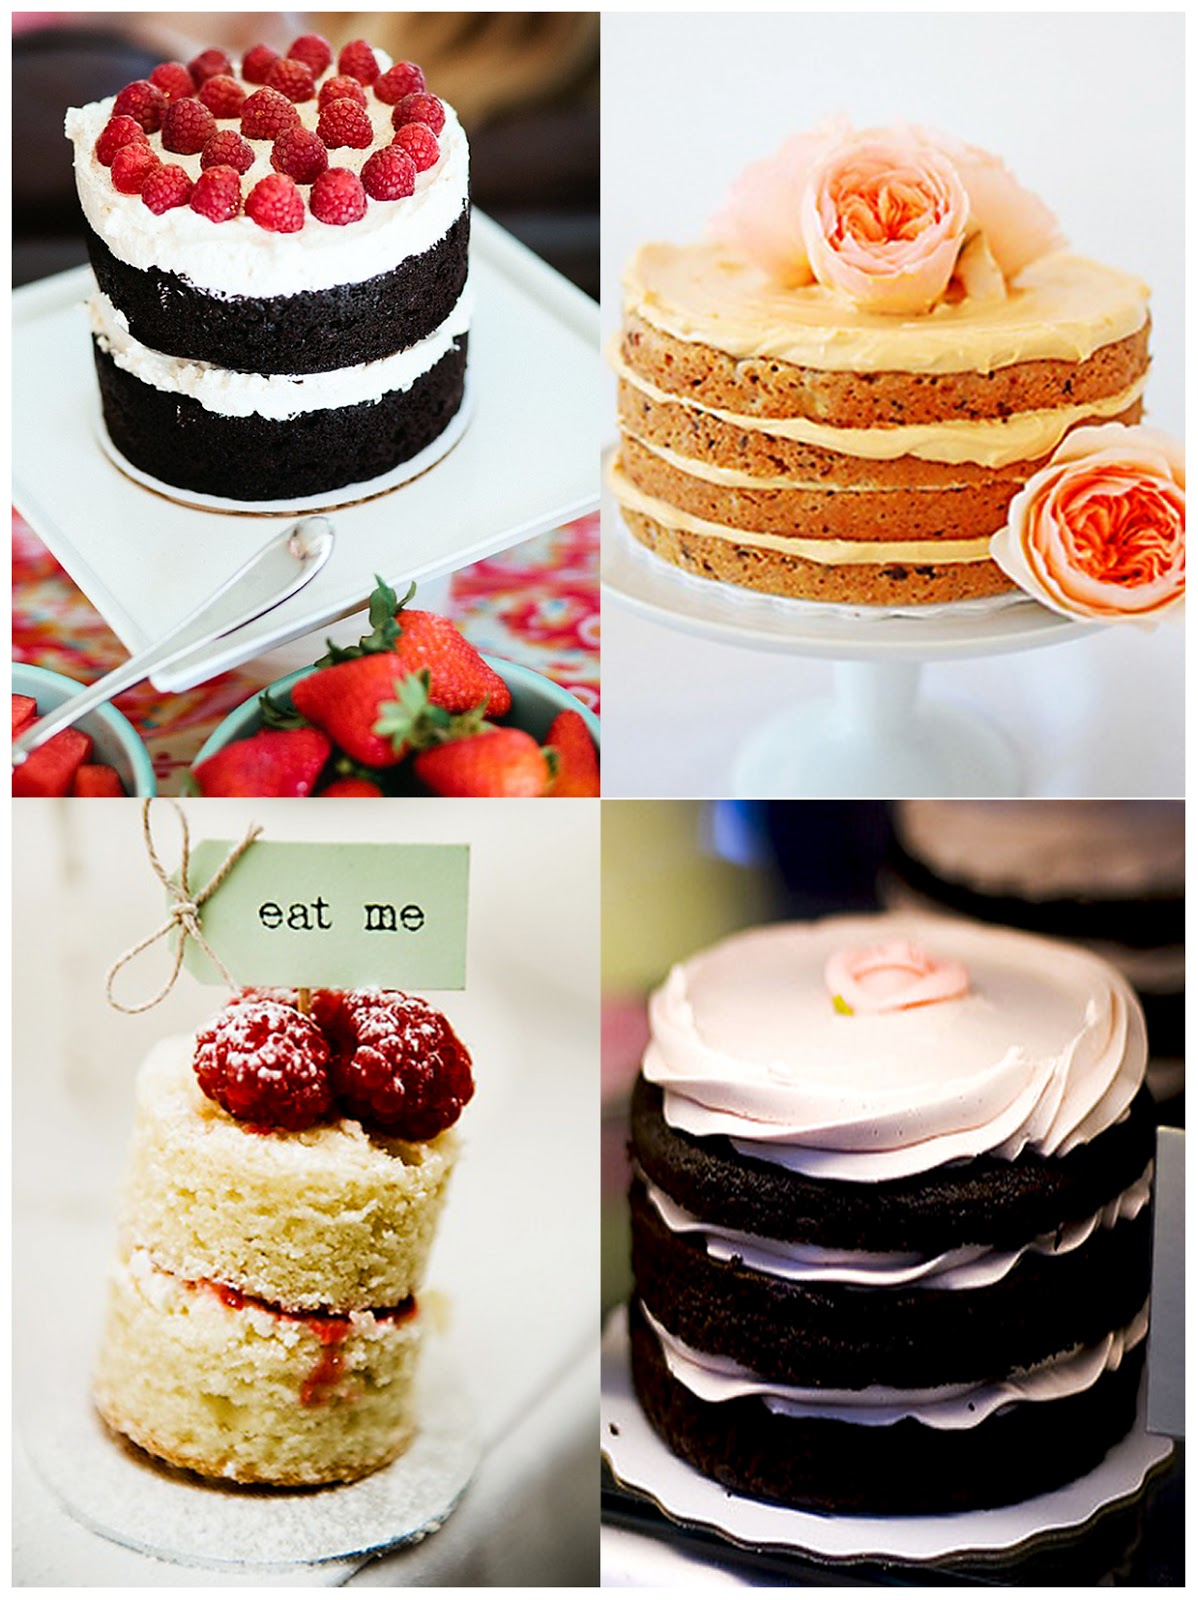 http://4.bp.blogspot.com/-p5U8qdPk0Kg/UYertfU51OI/AAAAAAAAPZI/Im9wDoSC1xk/s1600/naked-cake+(2).jpg